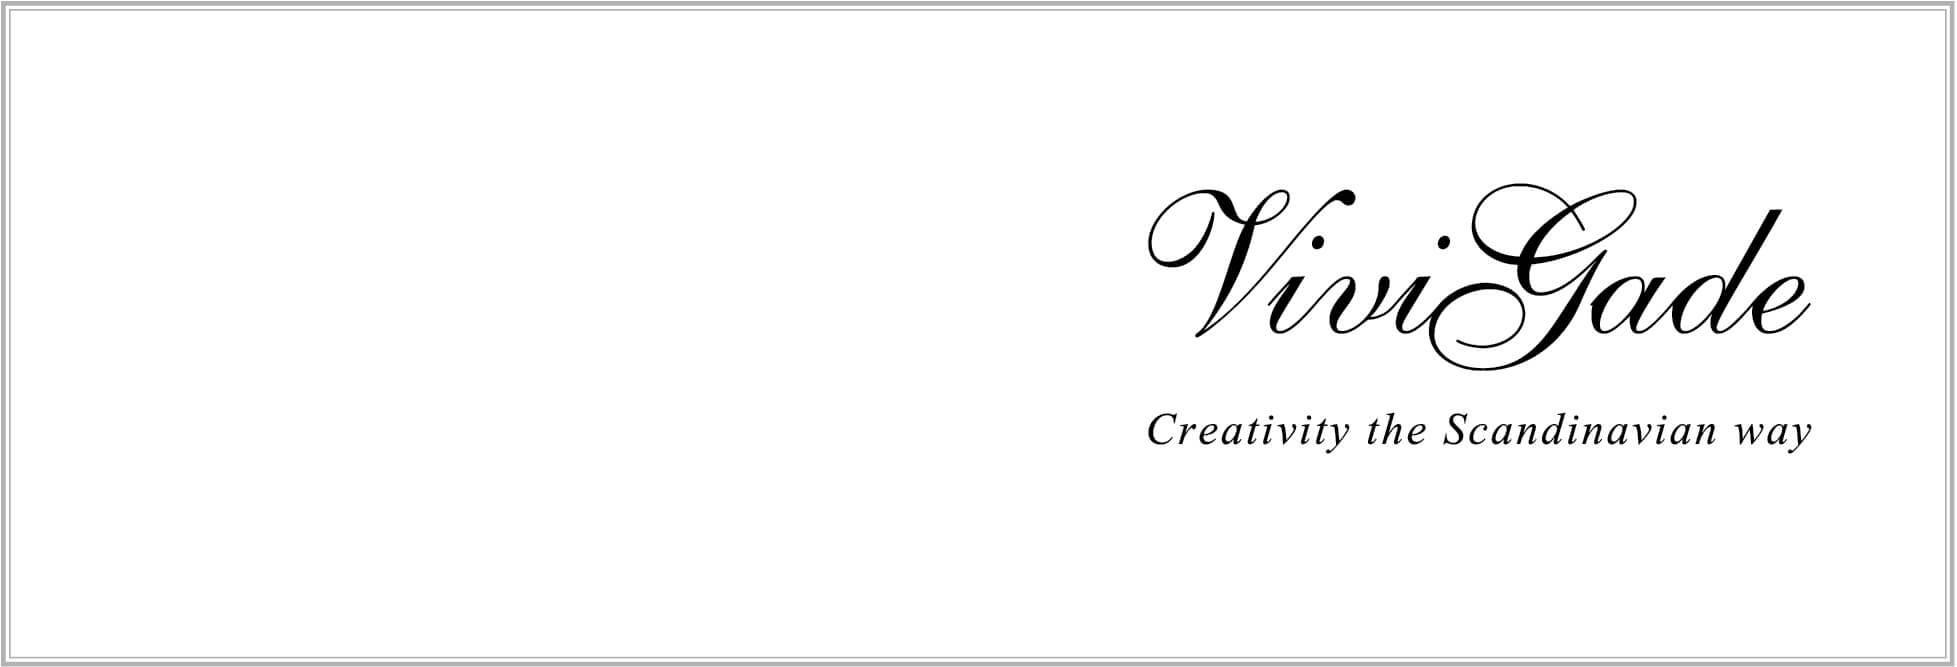 Creatieve ideeën